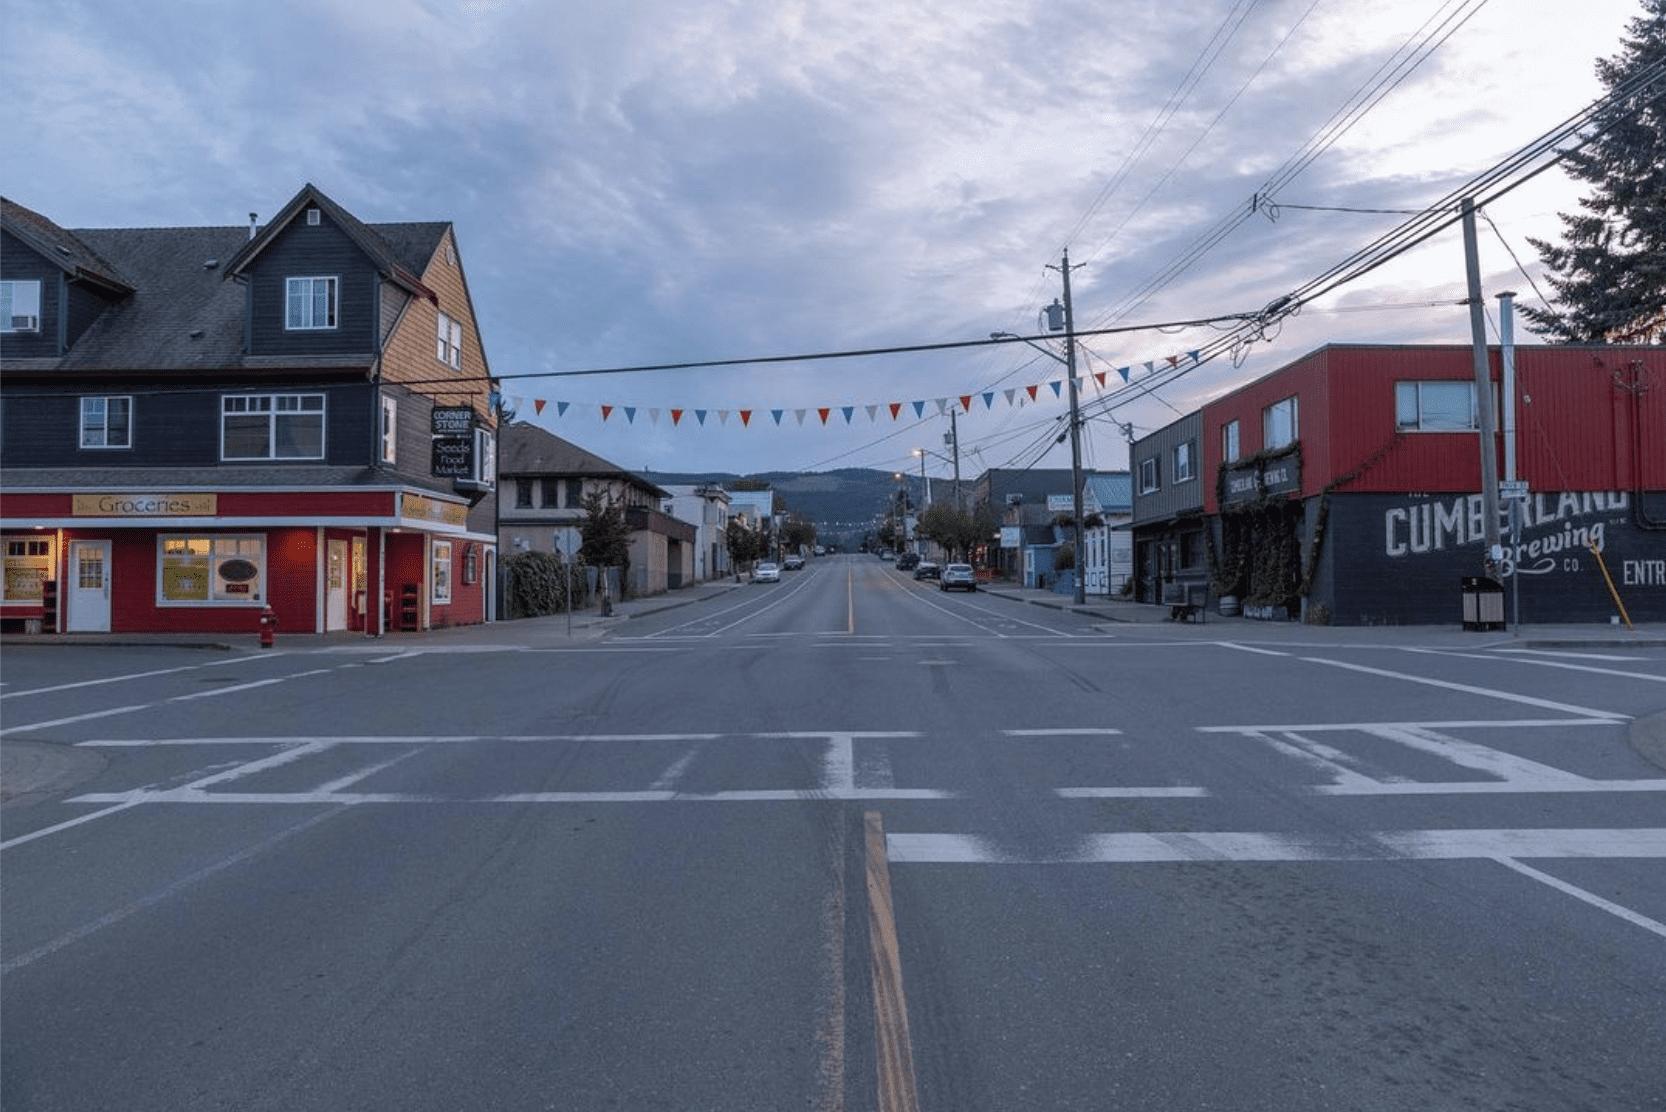 Village of Cumberland